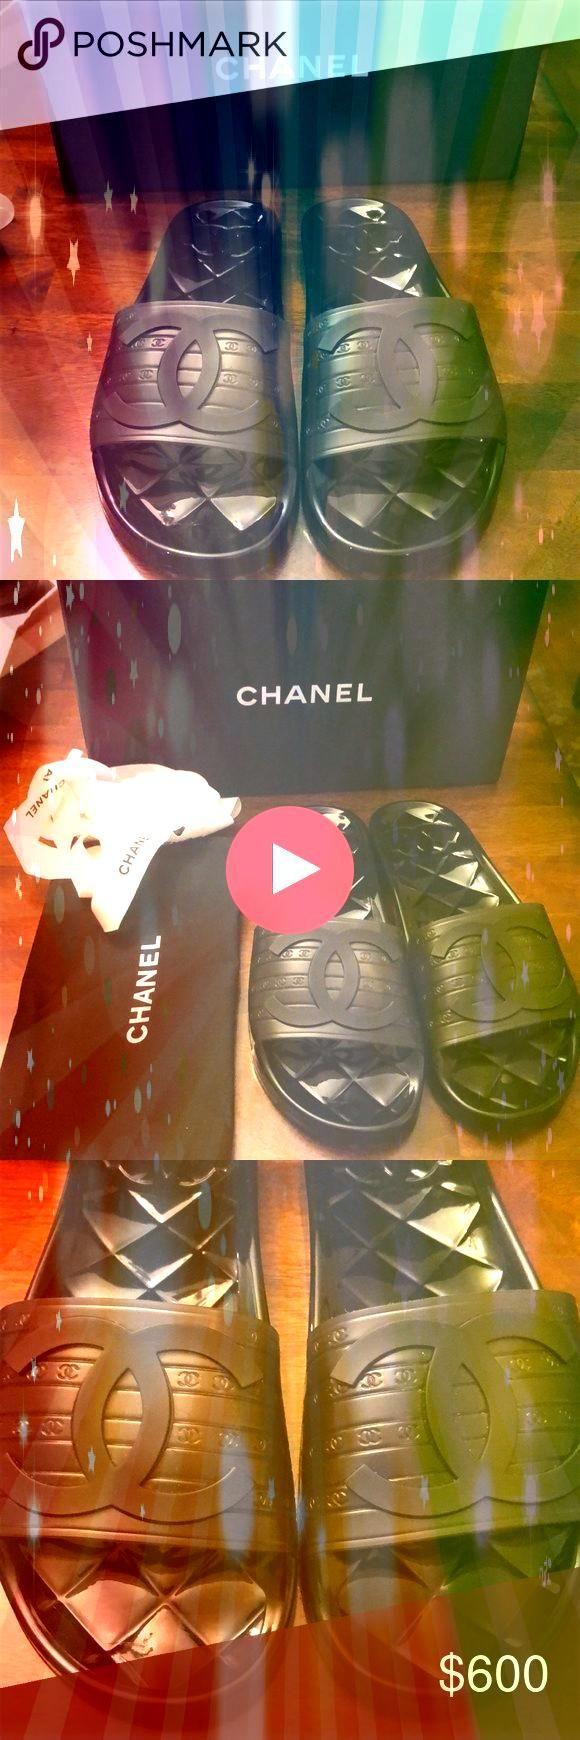 Black CC Logo Rubber Pool Slide Sandals 39 Worn once Chanel Black Striped  Chanel Black CC Logo Rubber Pool Slide Sandals 39 Worn once Chanel Black Striped Chanel Black C...